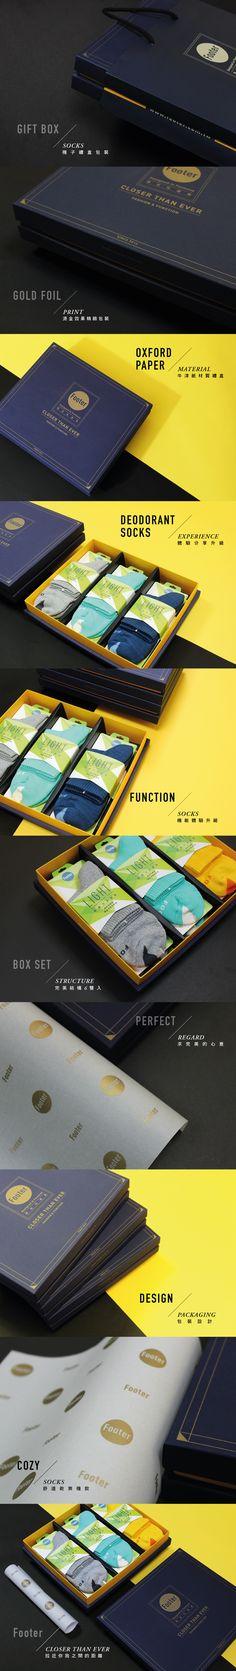 Footer / Gift Box Set / Packaging Design